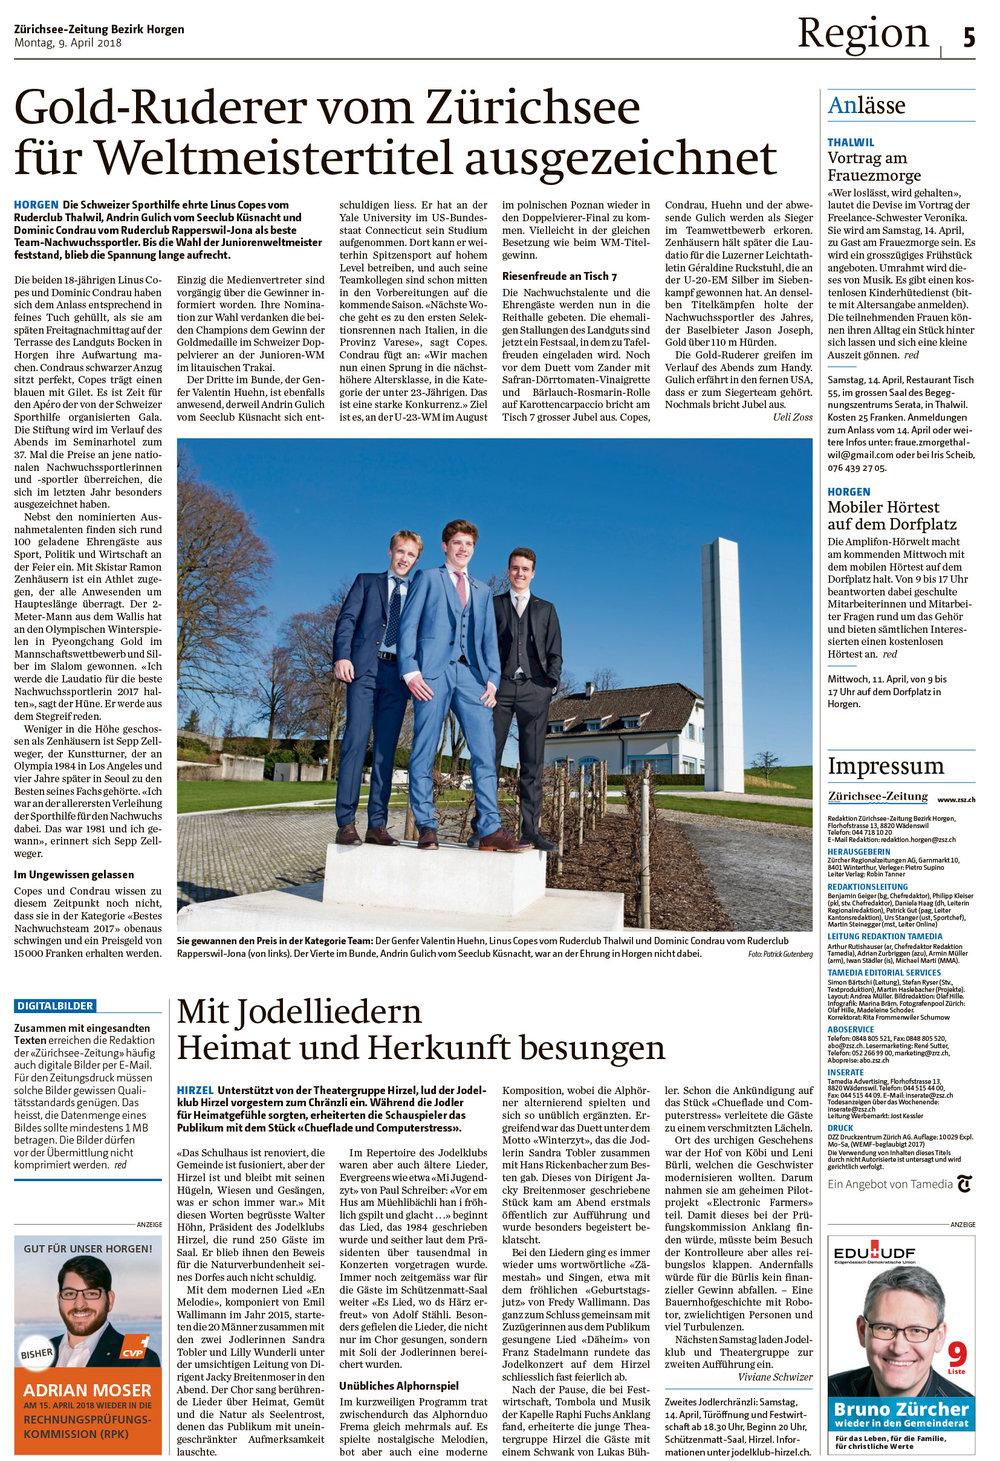 RCT_Goldruderer_2018_Seite_5_Ausgabe_Bezirk_Horgen_2018_04_09.jpg